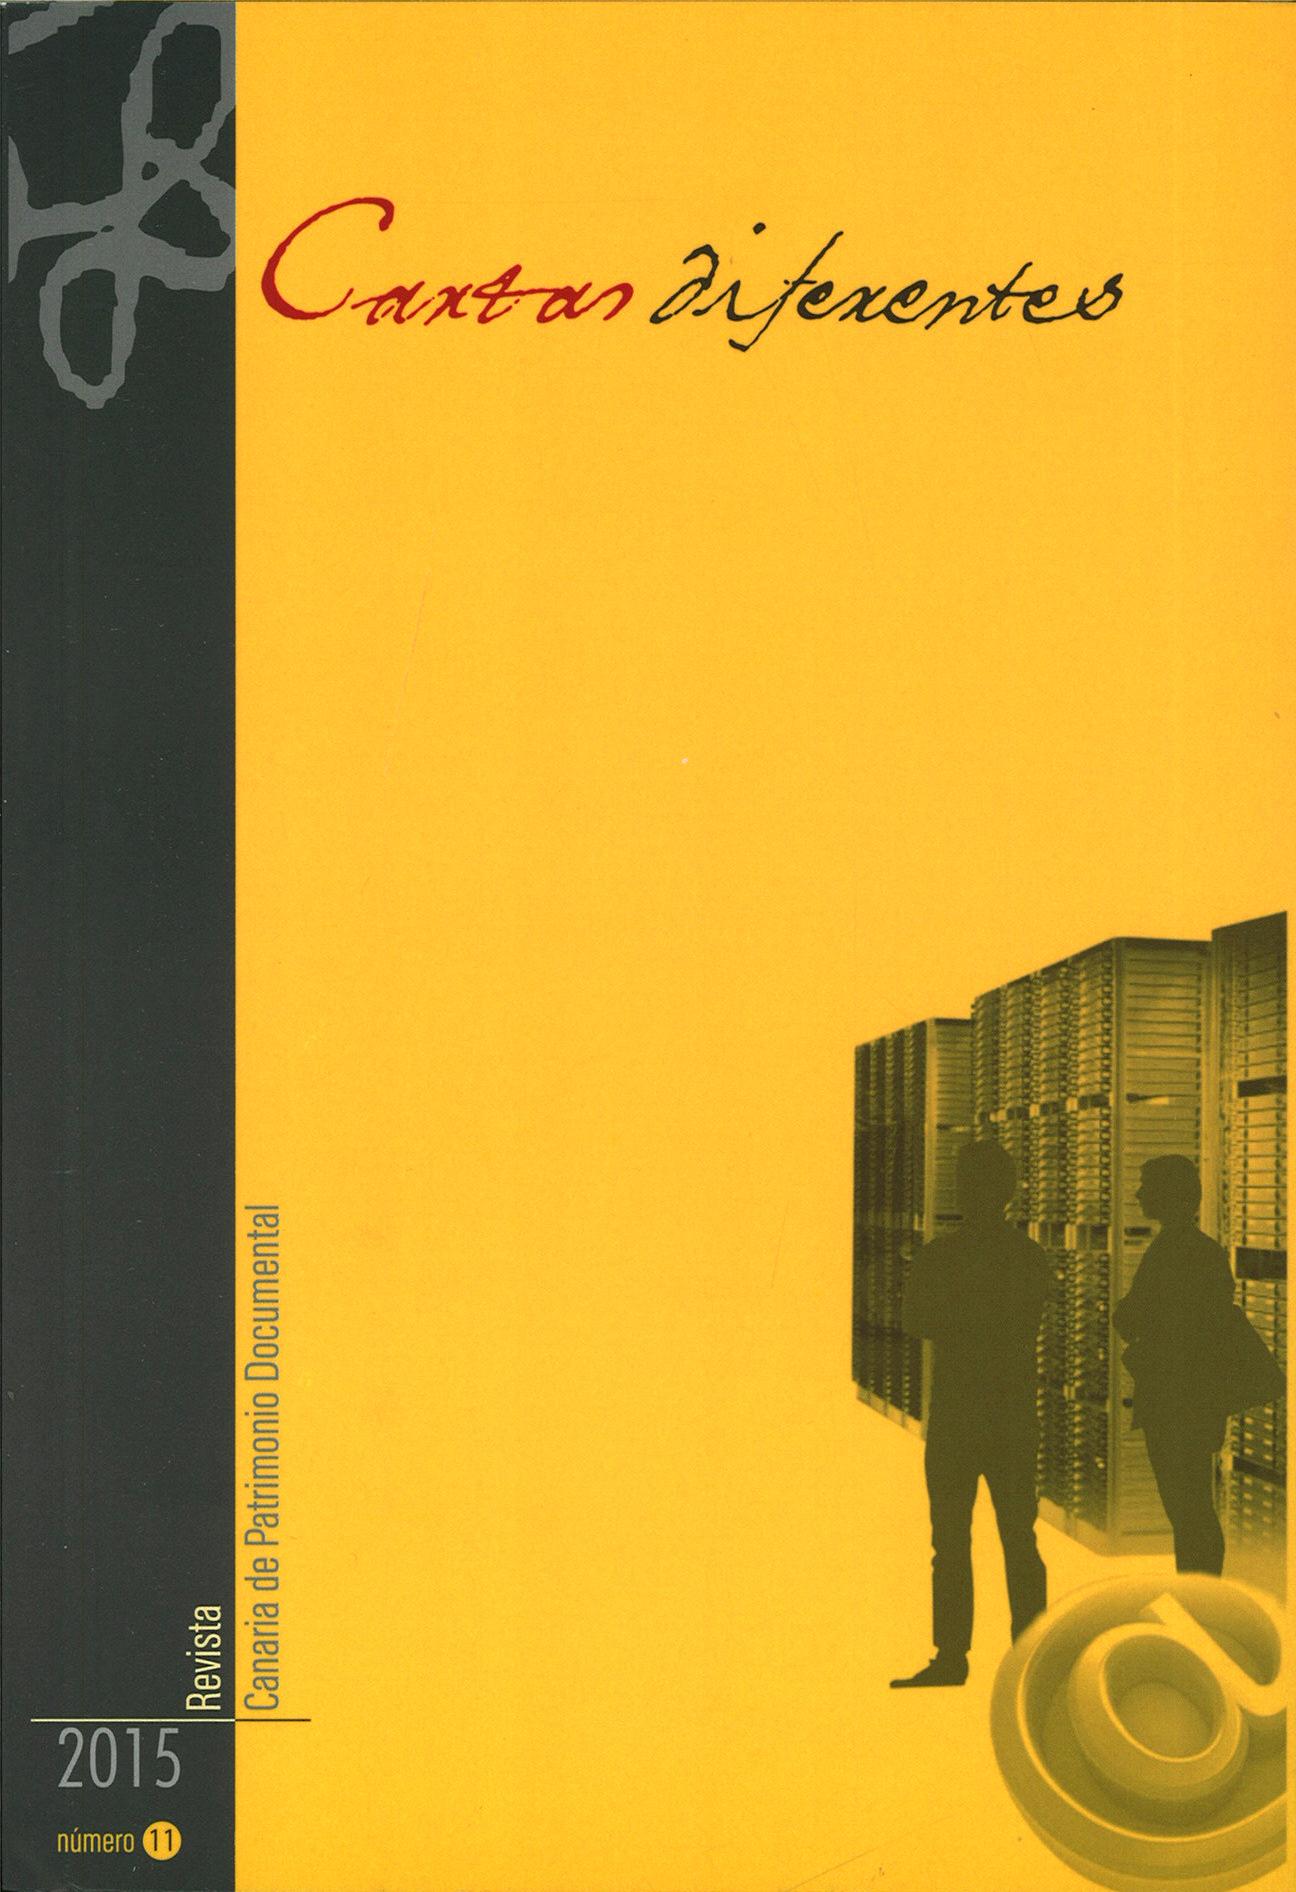 Cubierta 11 (2015)